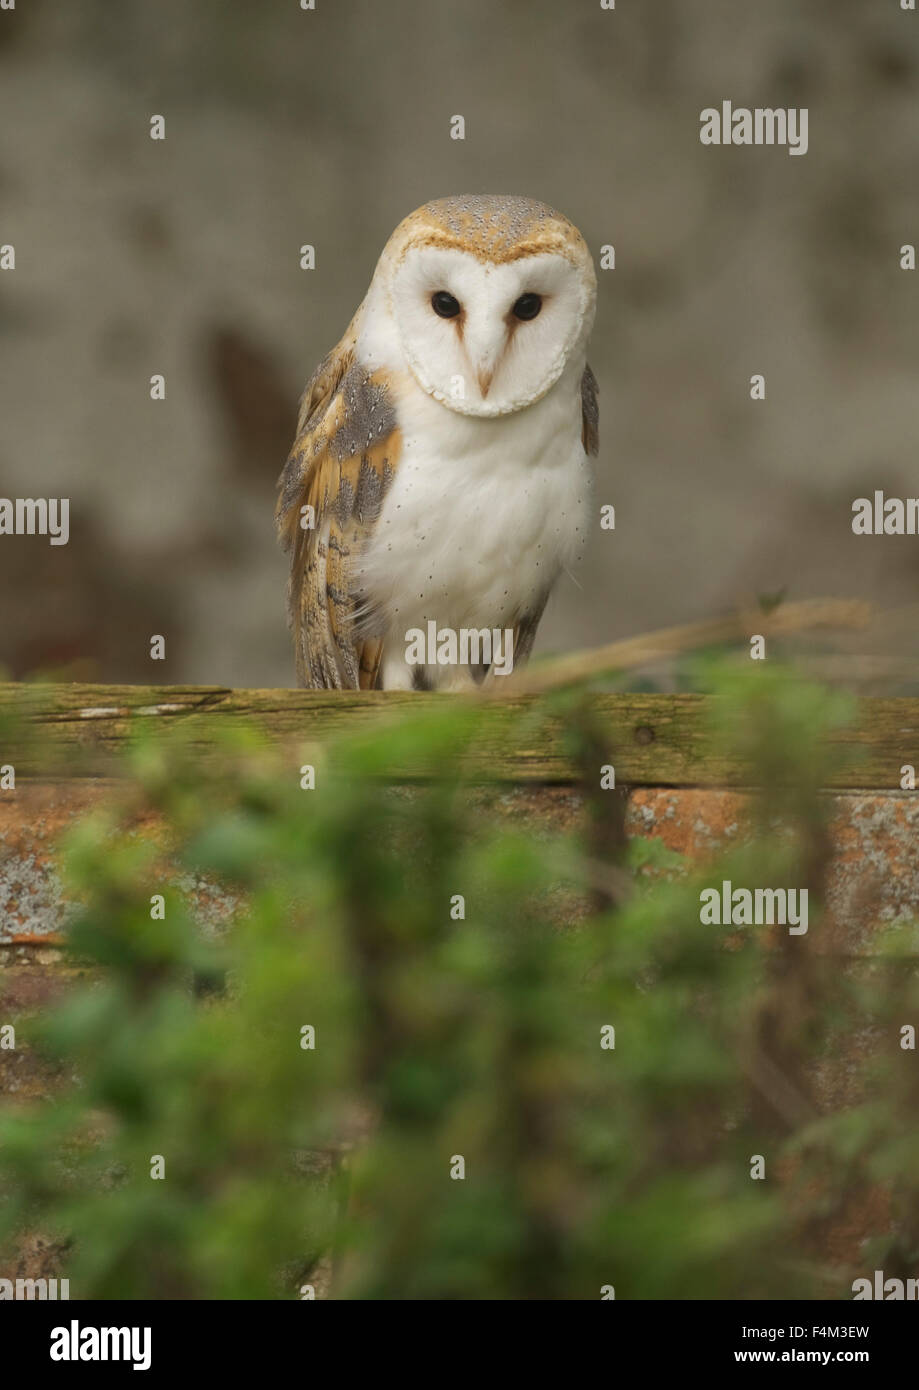 Barn Owl (Tyto alba) in a derelict barn - Stock Image